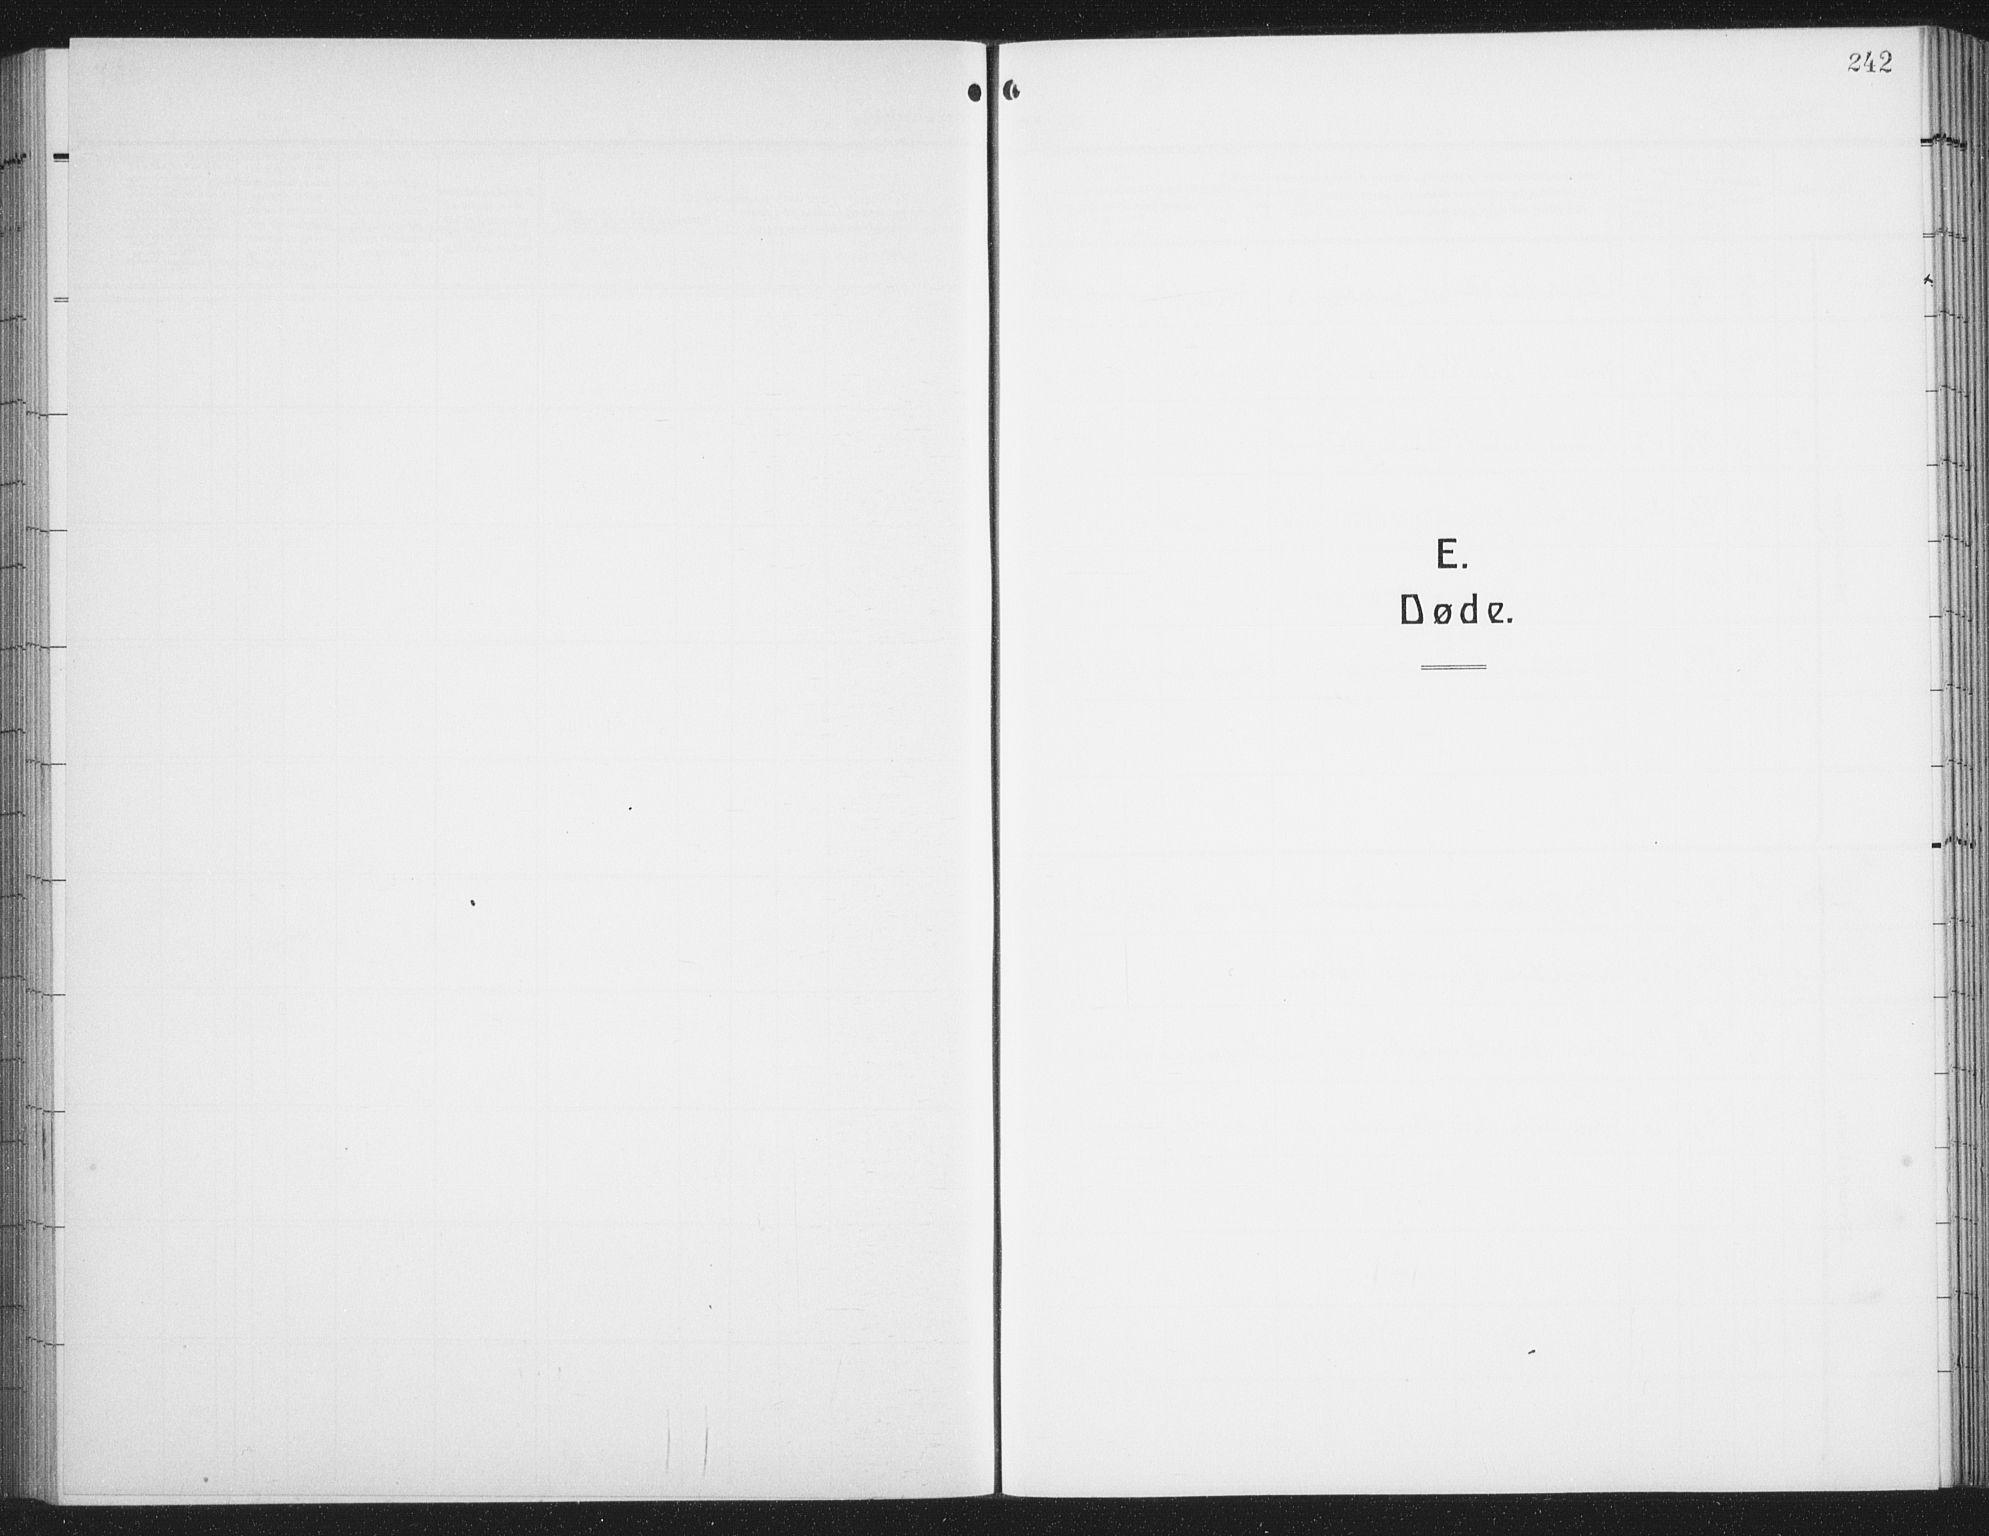 SAT, Ministerialprotokoller, klokkerbøker og fødselsregistre - Nordland, 876/L1106: Klokkerbok nr. 876C05, 1915-1942, s. 242